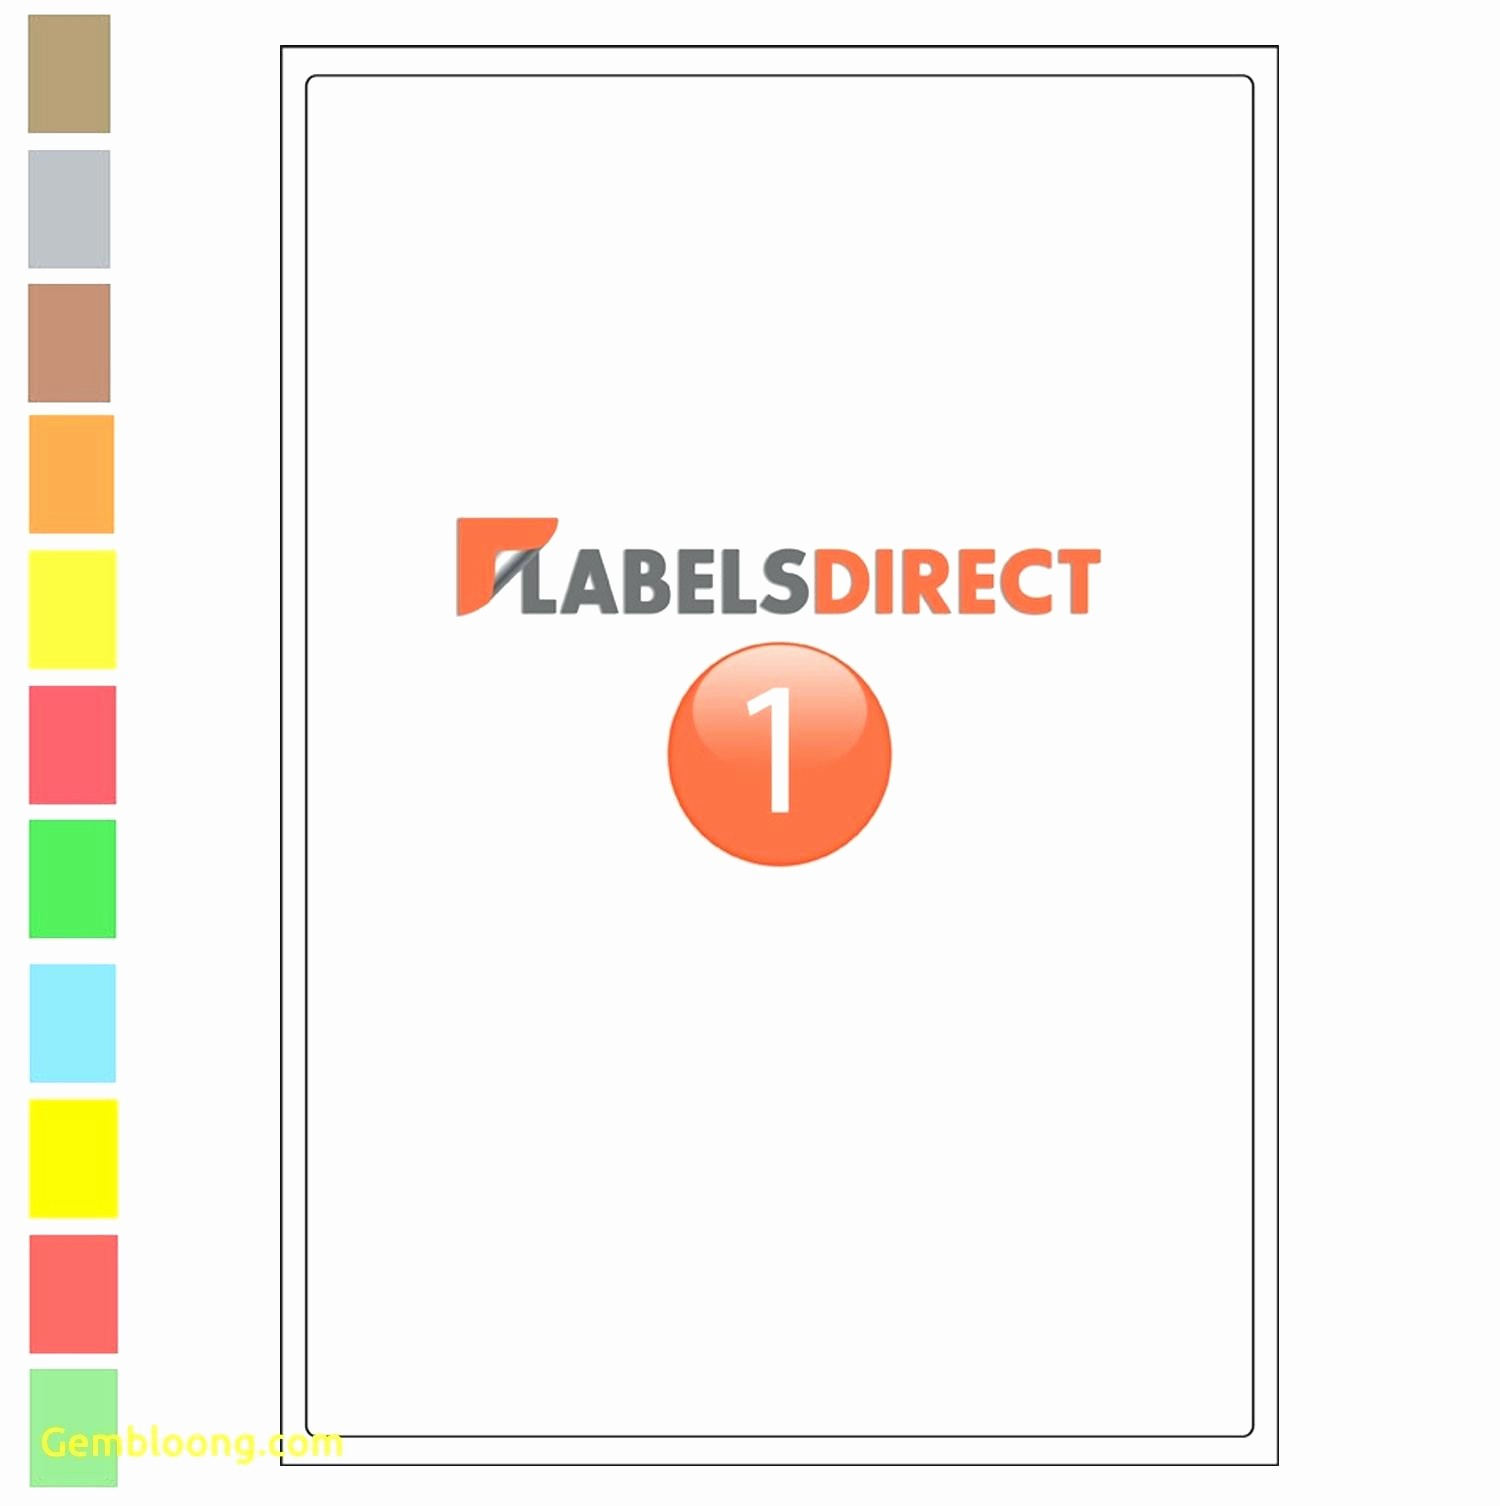 Mailing Labels 30 Per Sheet Lovely Return Address Labels Template 30 Per Sheet